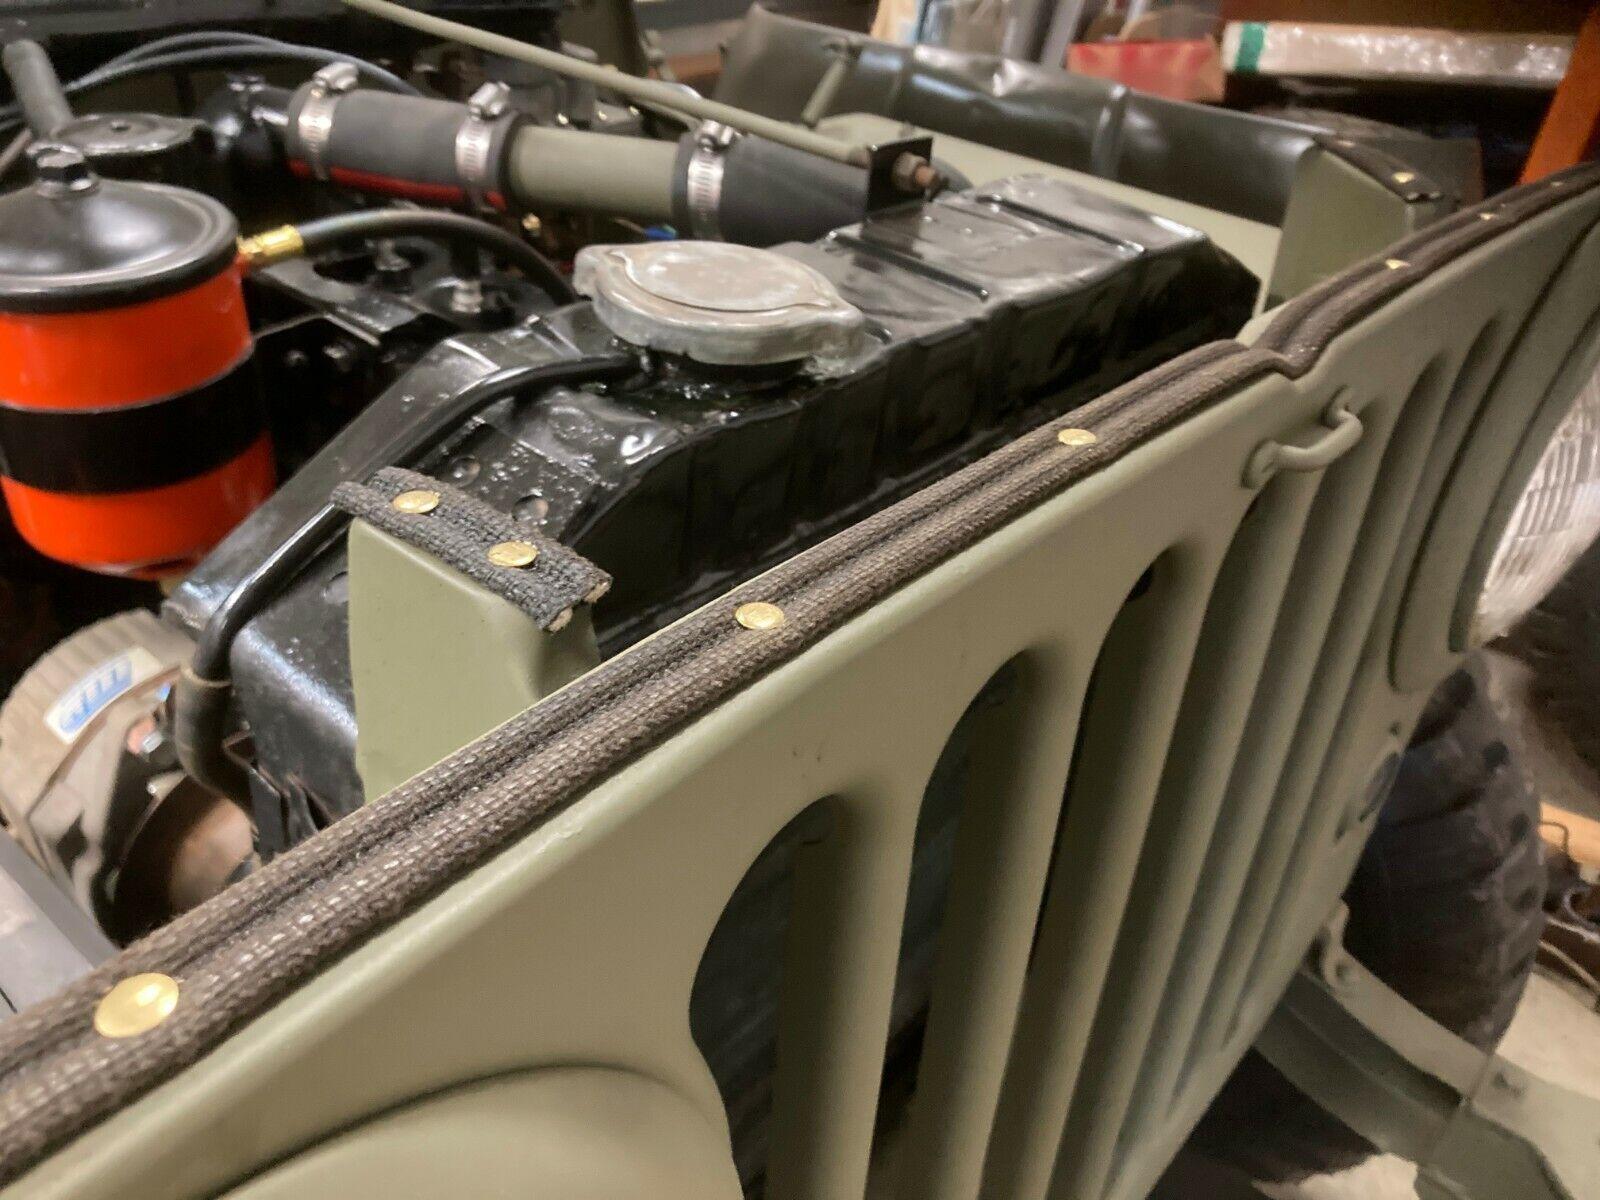 Fits Willys MB GPW CJ2A early CJ3A M38 jeep Grill Felt Seal CORRECT